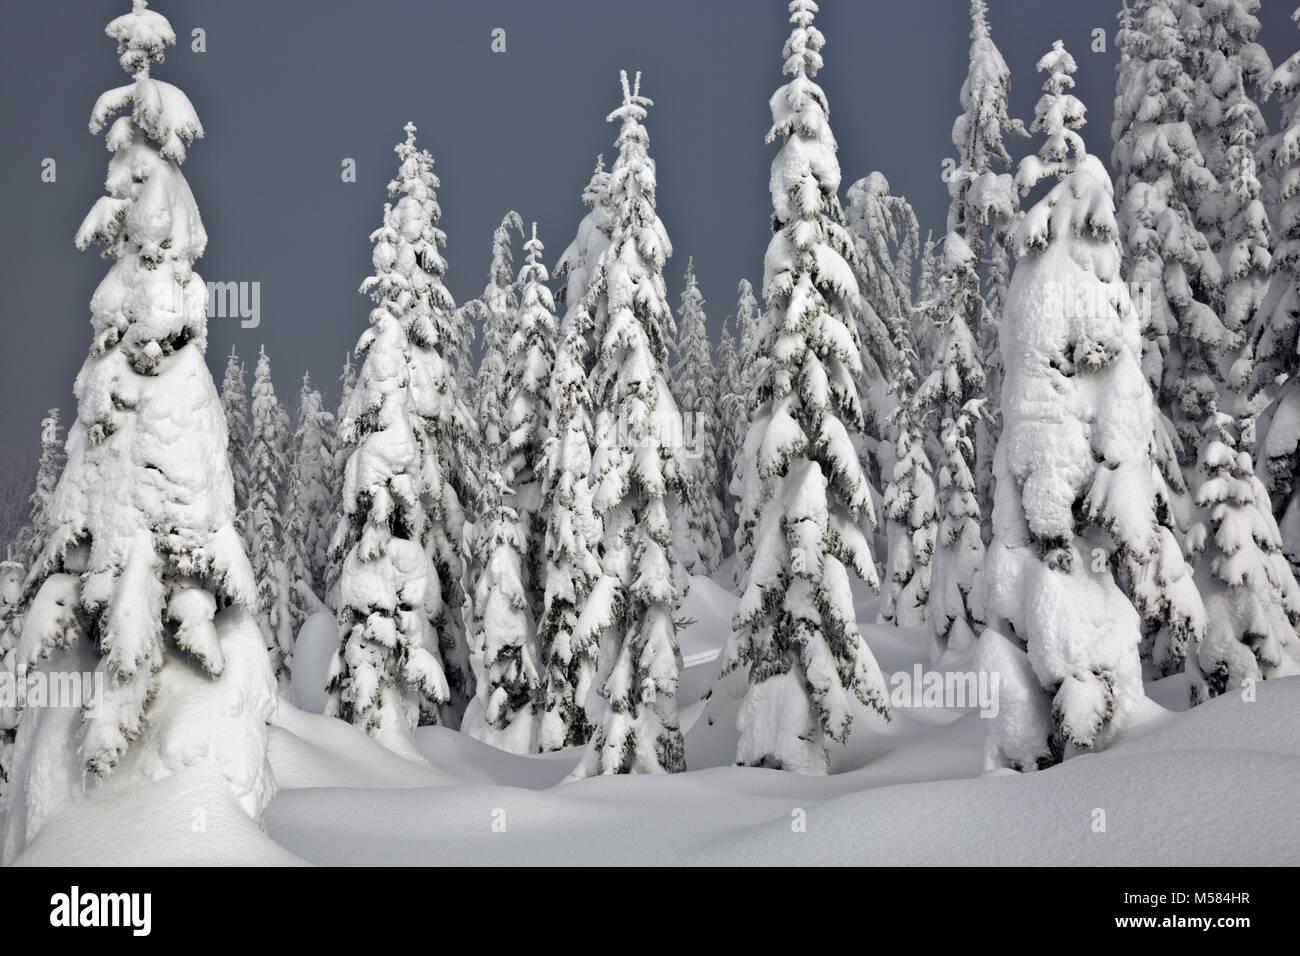 WA13529-00...WASHINGTON - Snow covered trees on Amabilis Mountain in the Okanogan-Wenatchee National Forest. - Stock Image